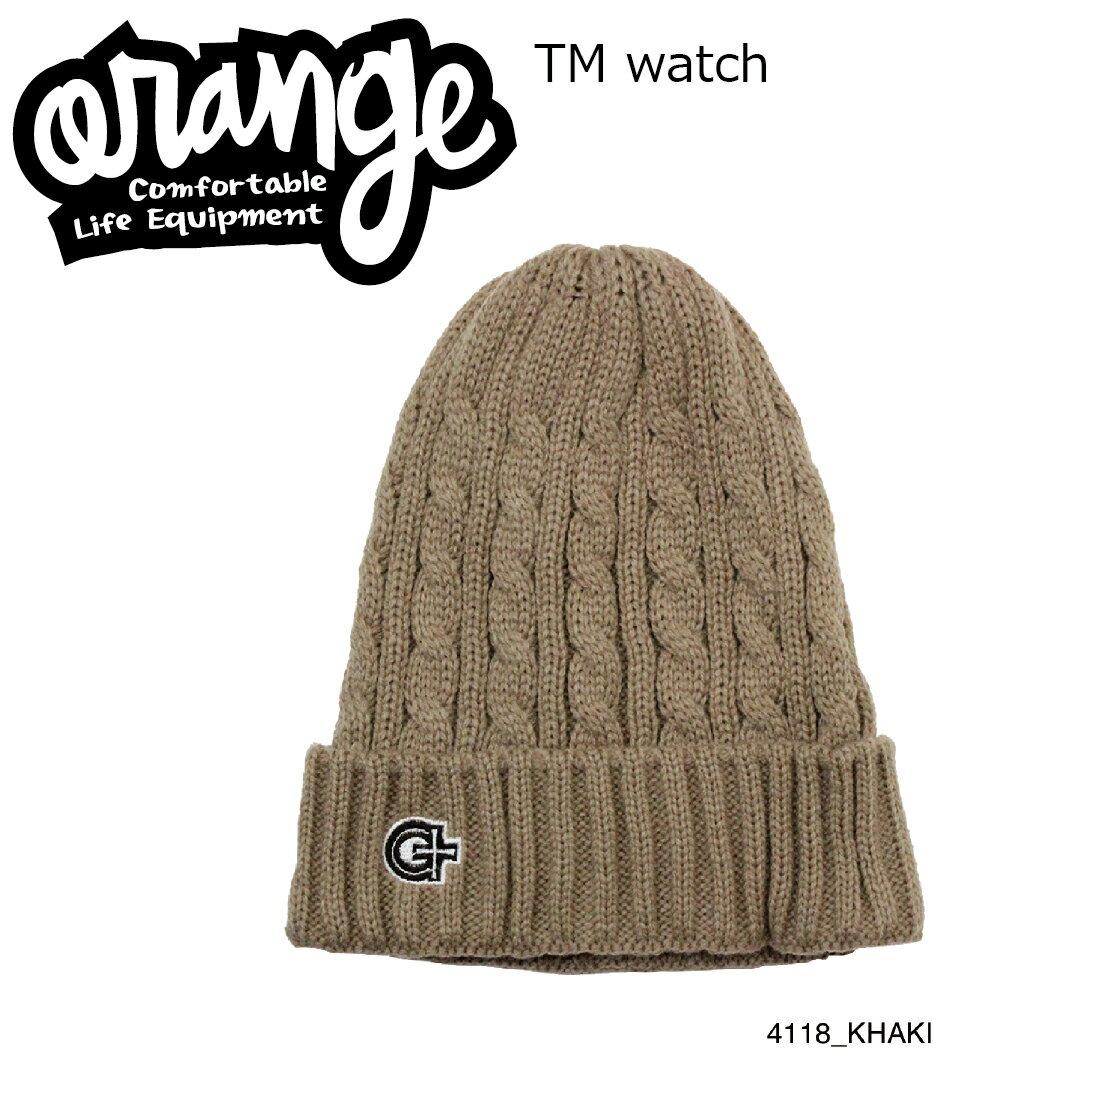 Oran'ge Tm Watch Cap Beanie 4118 KHAKI オレンジ ティーエム ワッチ キャップ ビーニー ニットキャップ 2つ折り